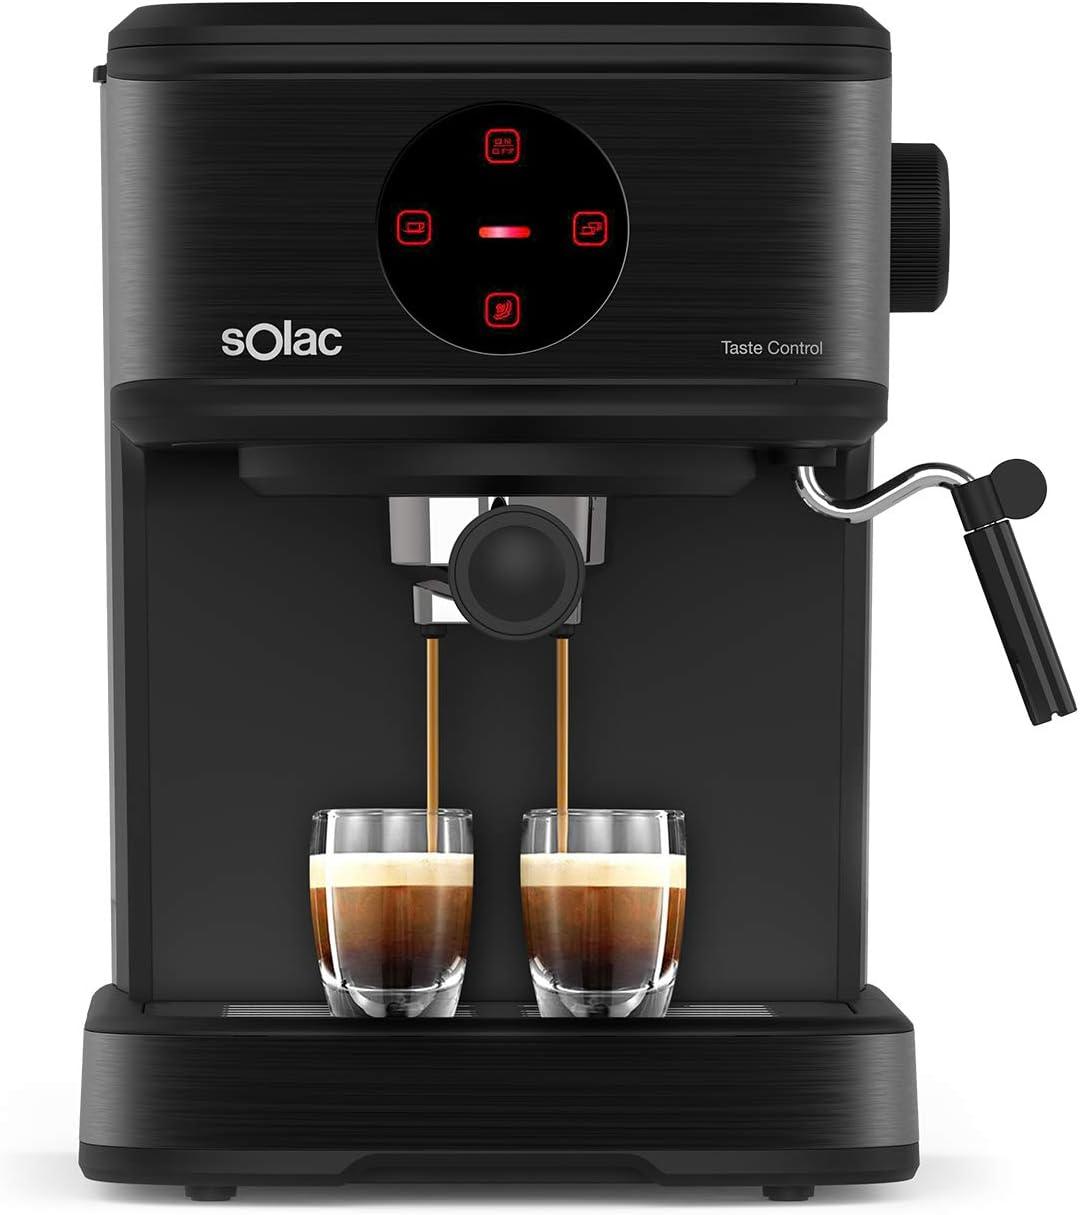 Solac CE4498 Taste Control - Cafetera espresso táctil, 20bar, Double Cream, Espresso y Cappuccino, 850W, parada automática, 1 o 2 cafés, Monodosis/molido, Vaporizador de acero inoxidable, 1.5 L, negra